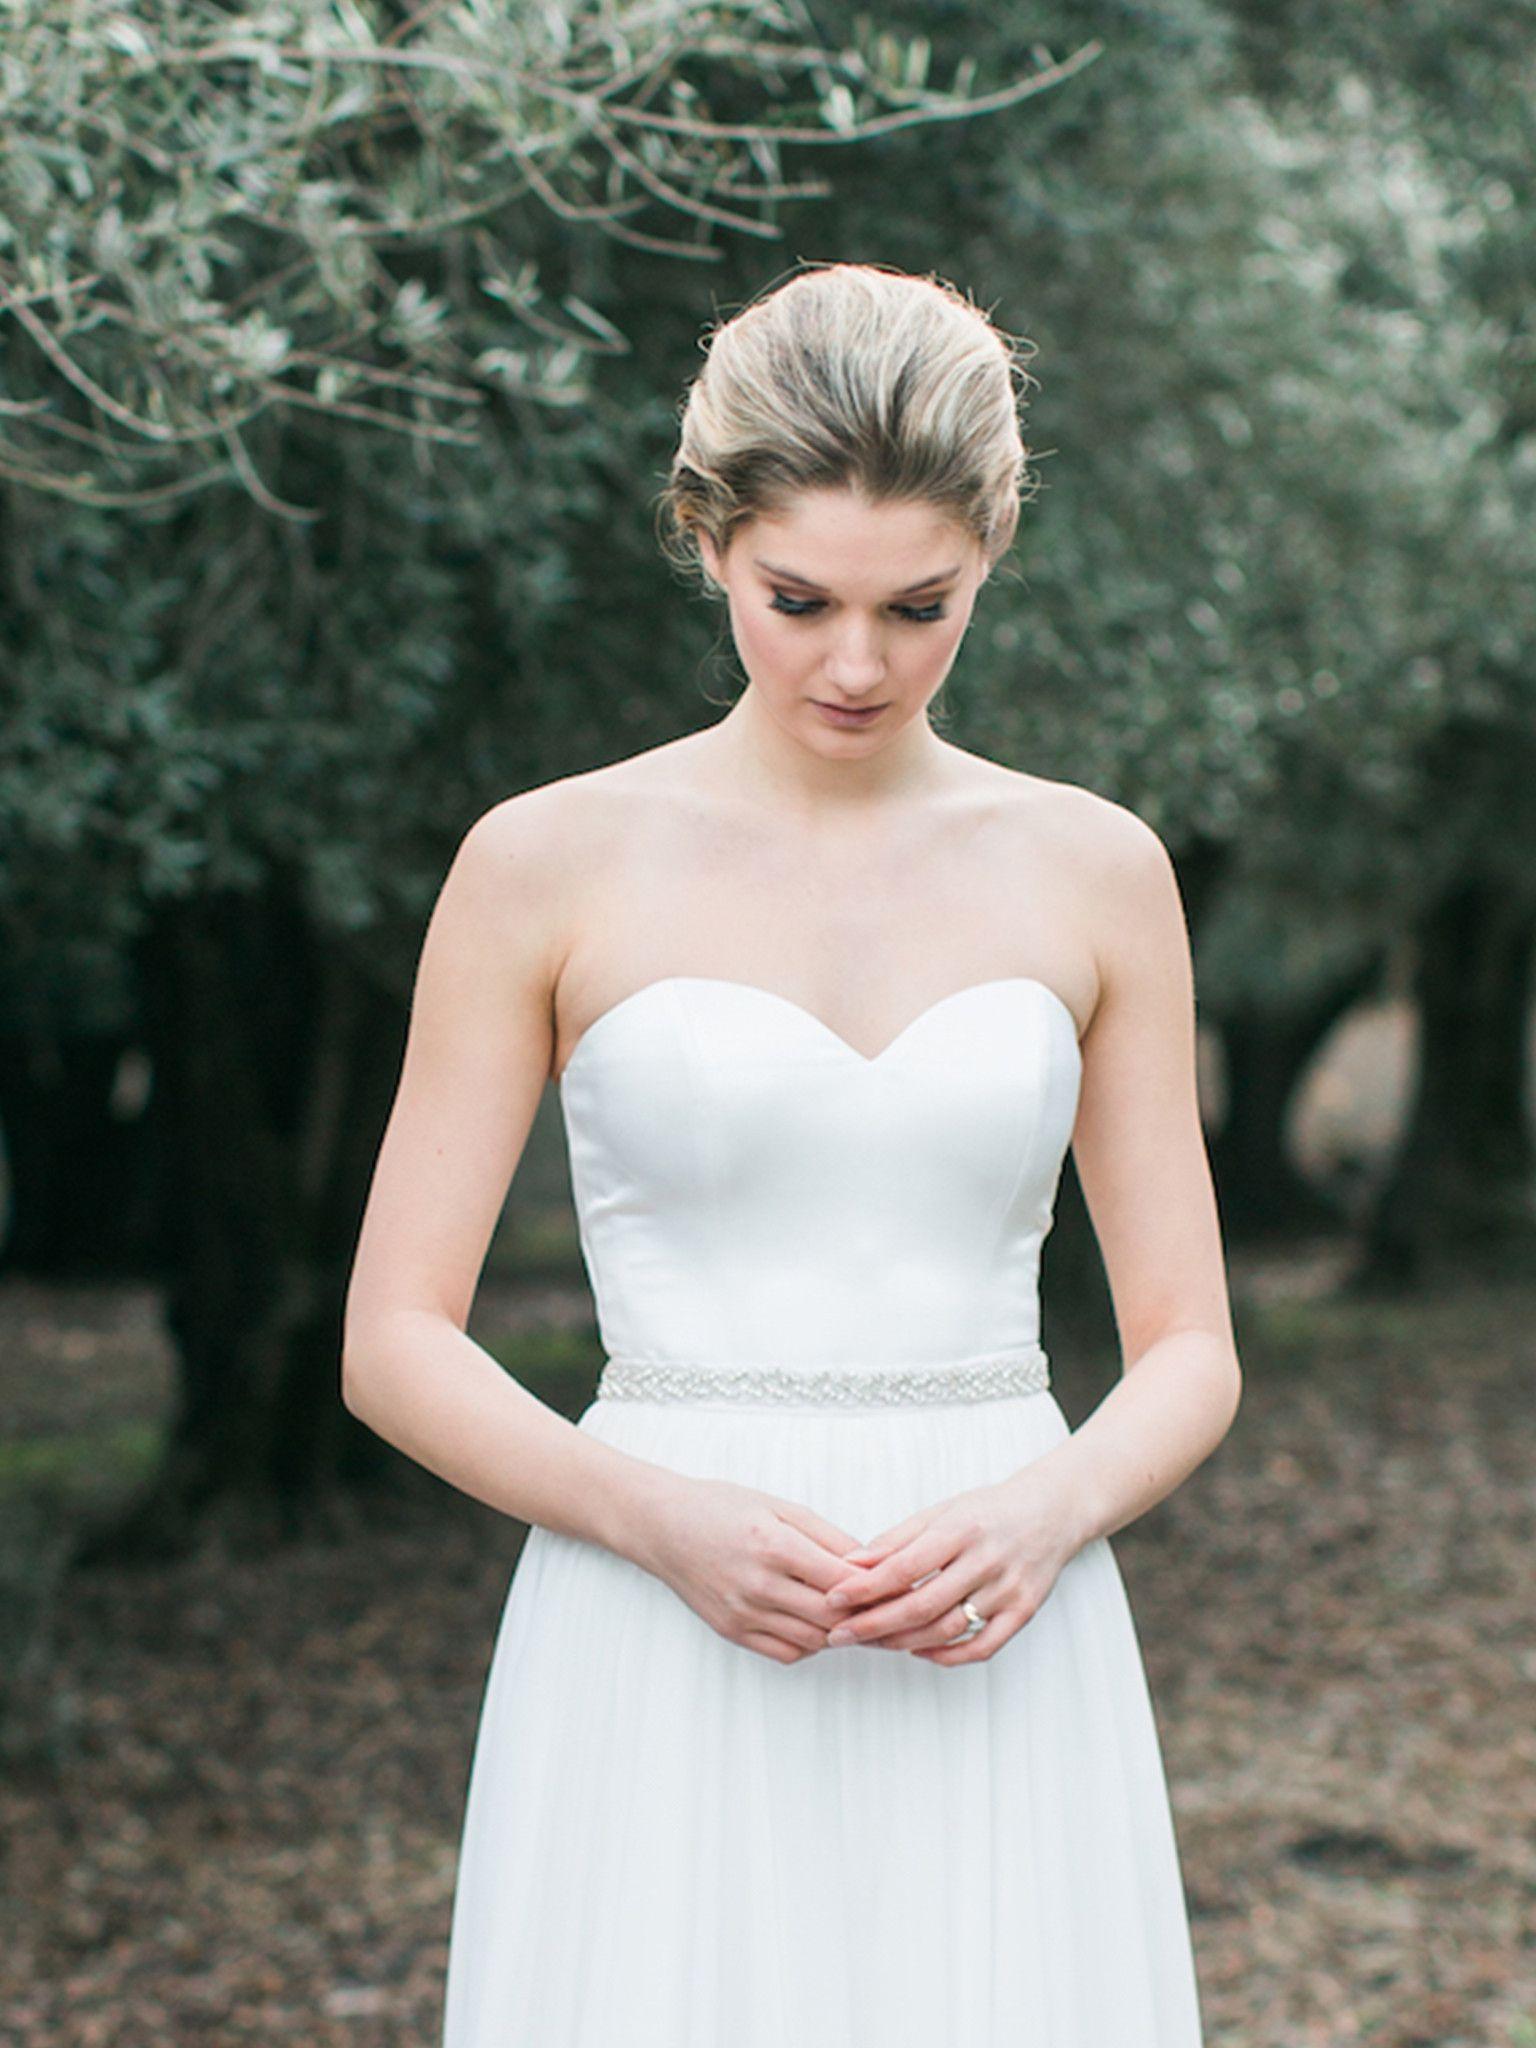 Classic corset wedding dresses top wedding dresses